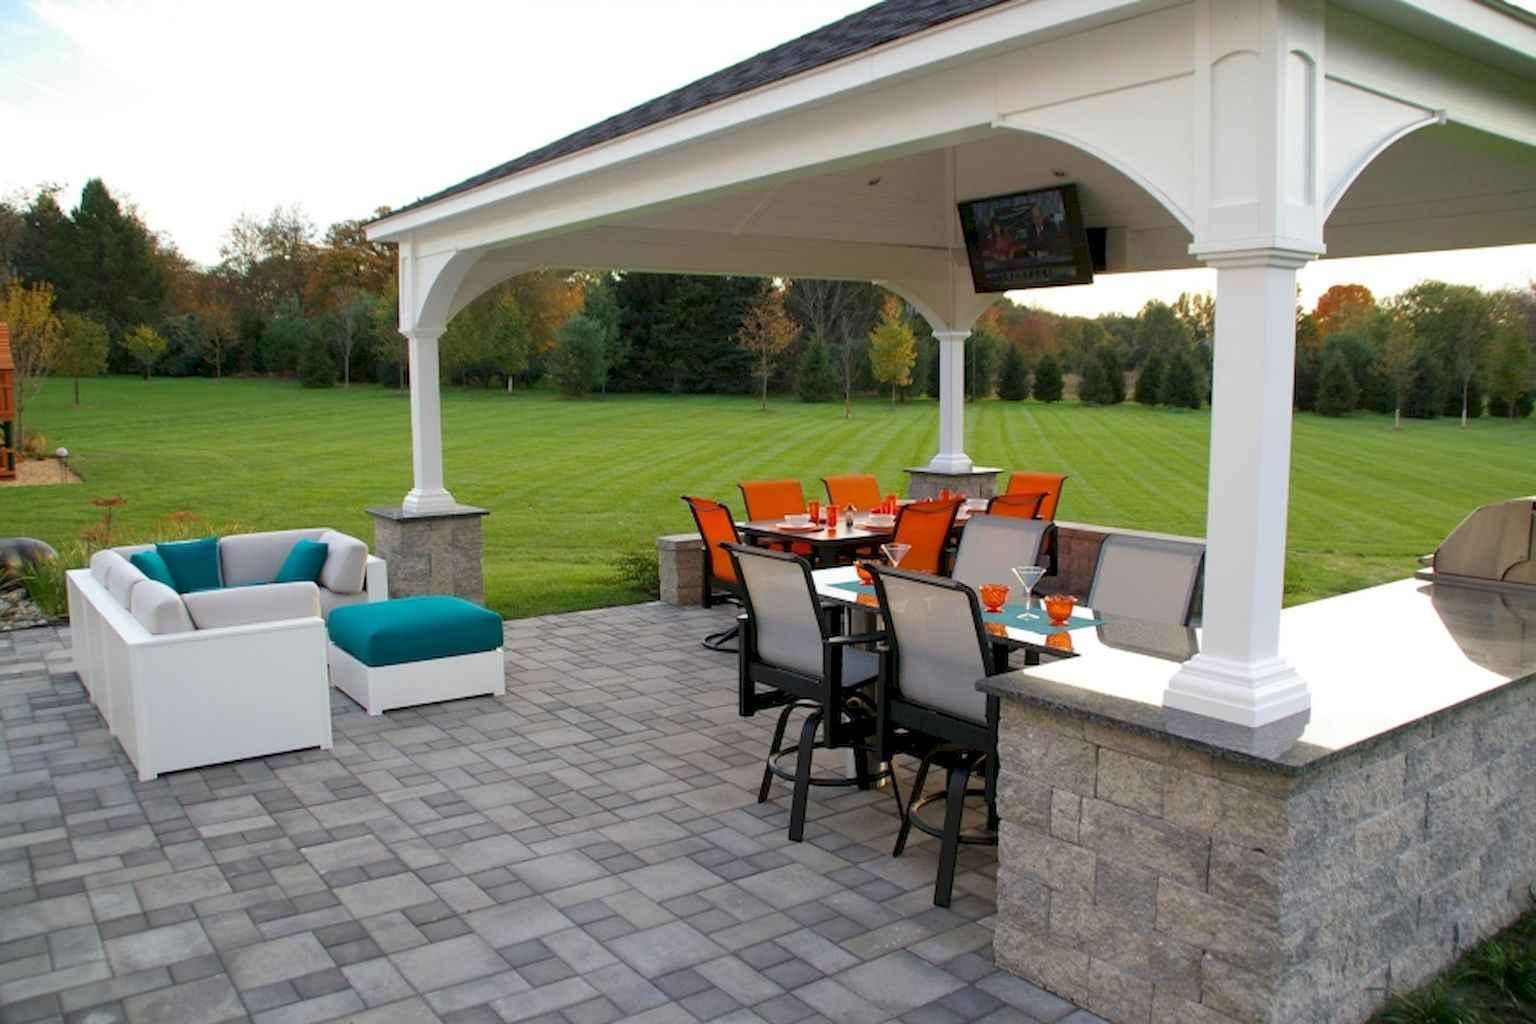 Top 25 Stunning Backyard Patio Design Ideas (19)